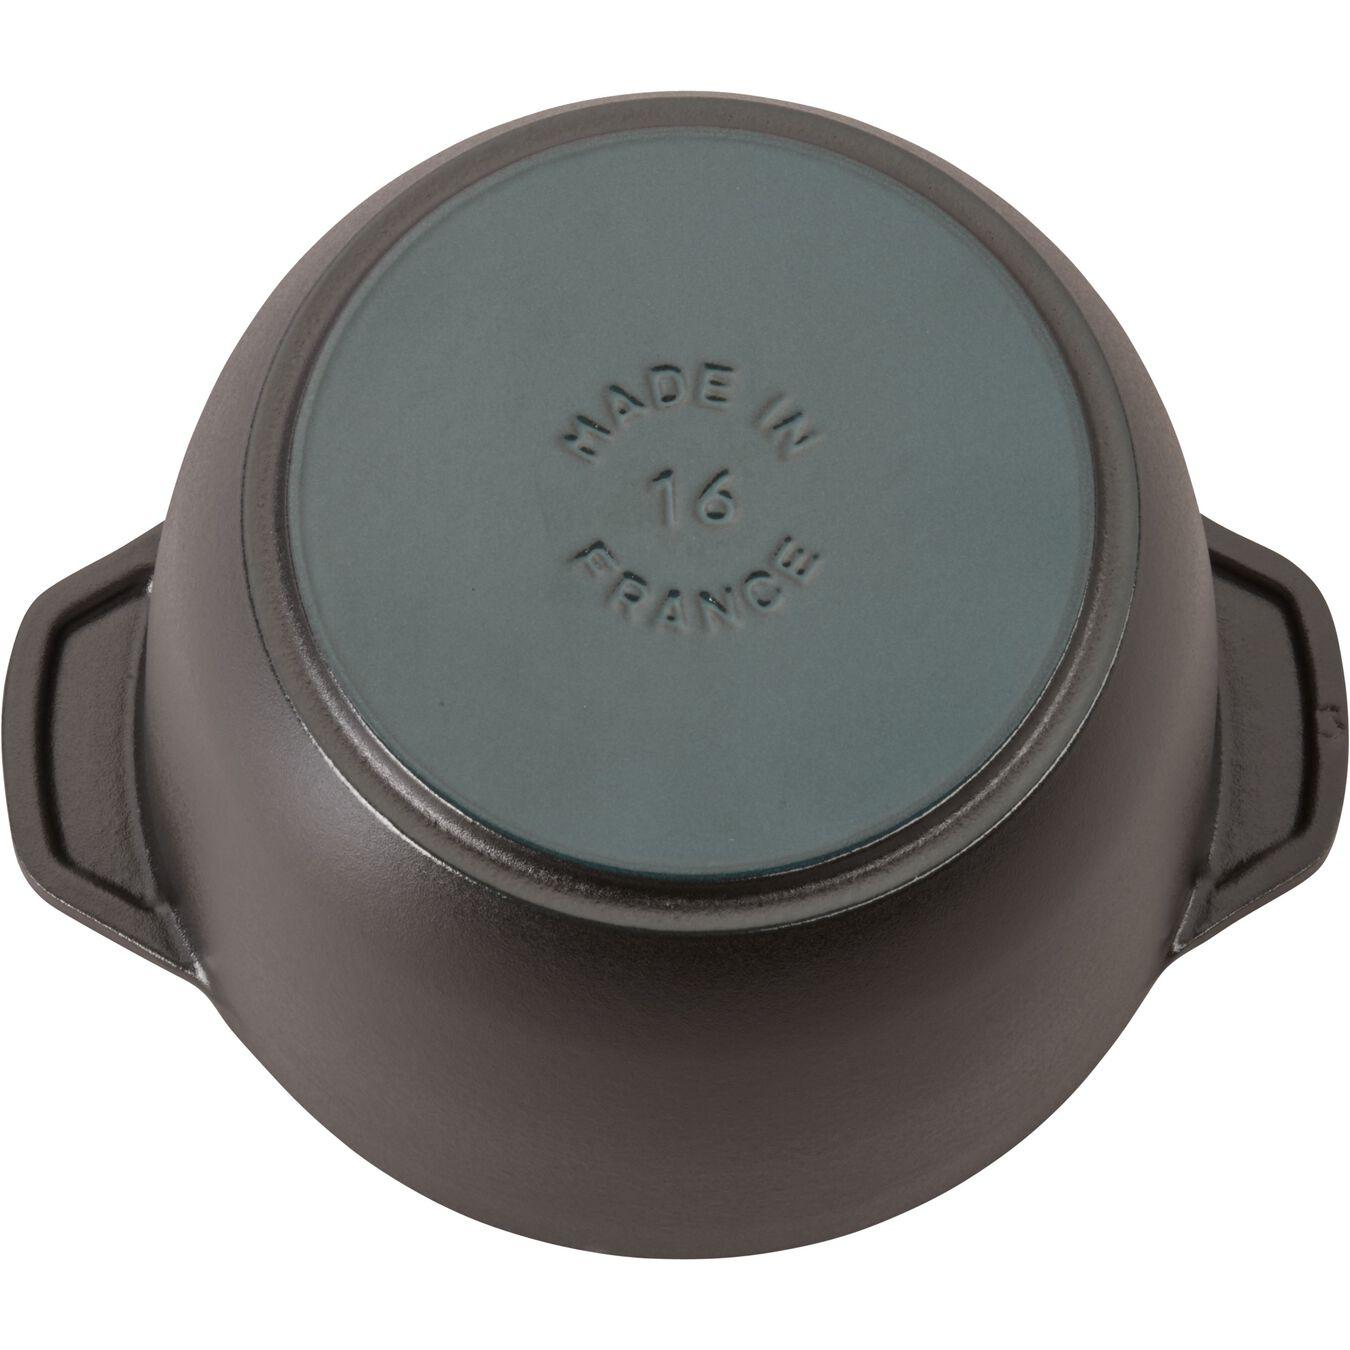 1.5 l Cast iron round Rice Cocotte, Black,,large 9